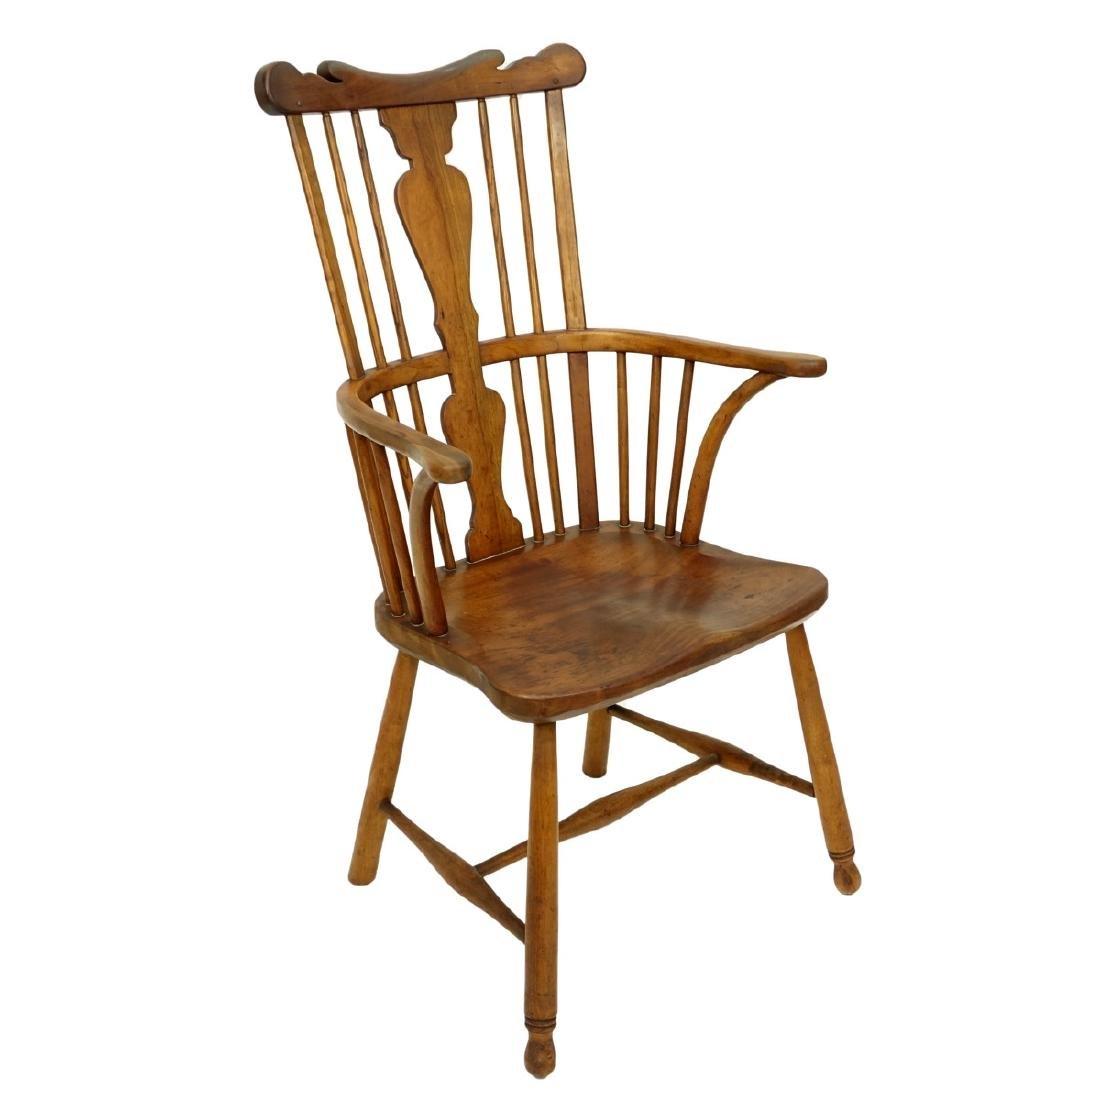 L. & J.G. Stickley Windsor Chair